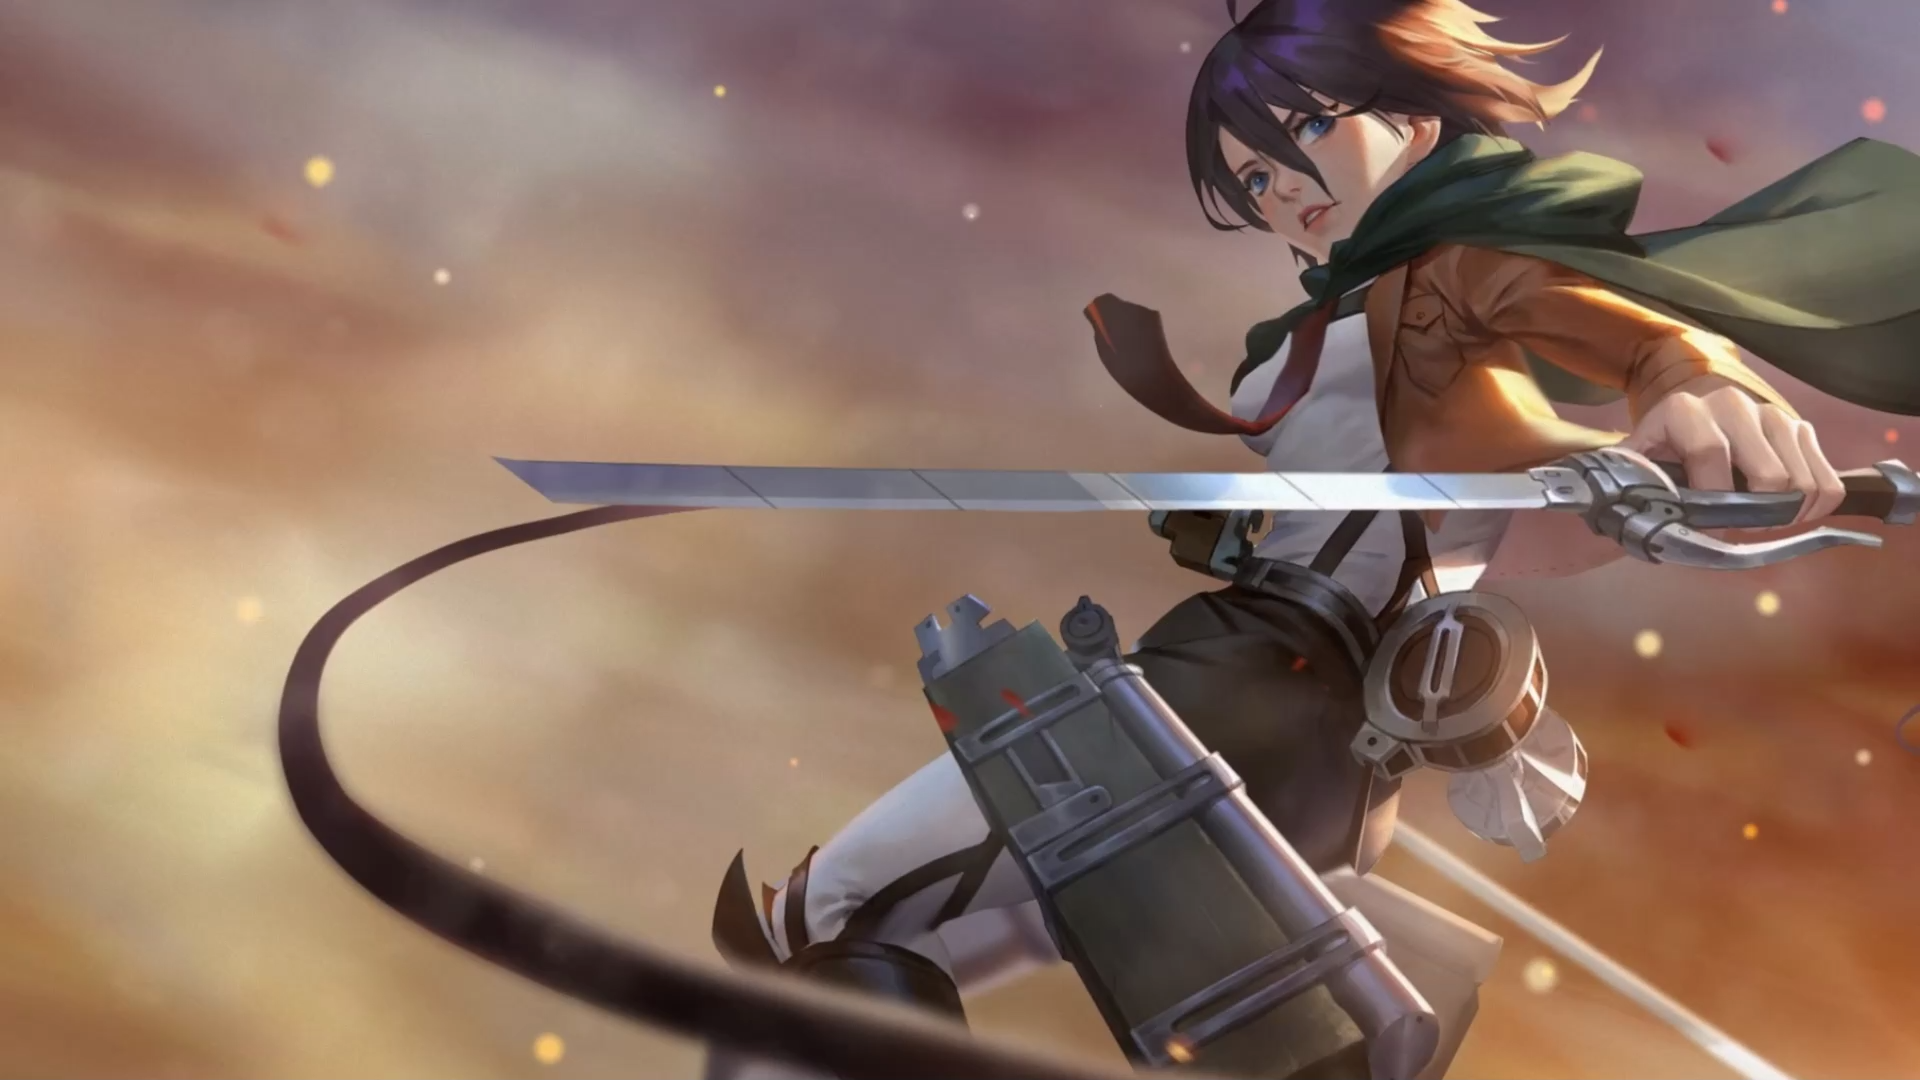 Video Mikasa Anime Wallpaper Gambar Bergerak Fotografi Hujan Gadis Animasi